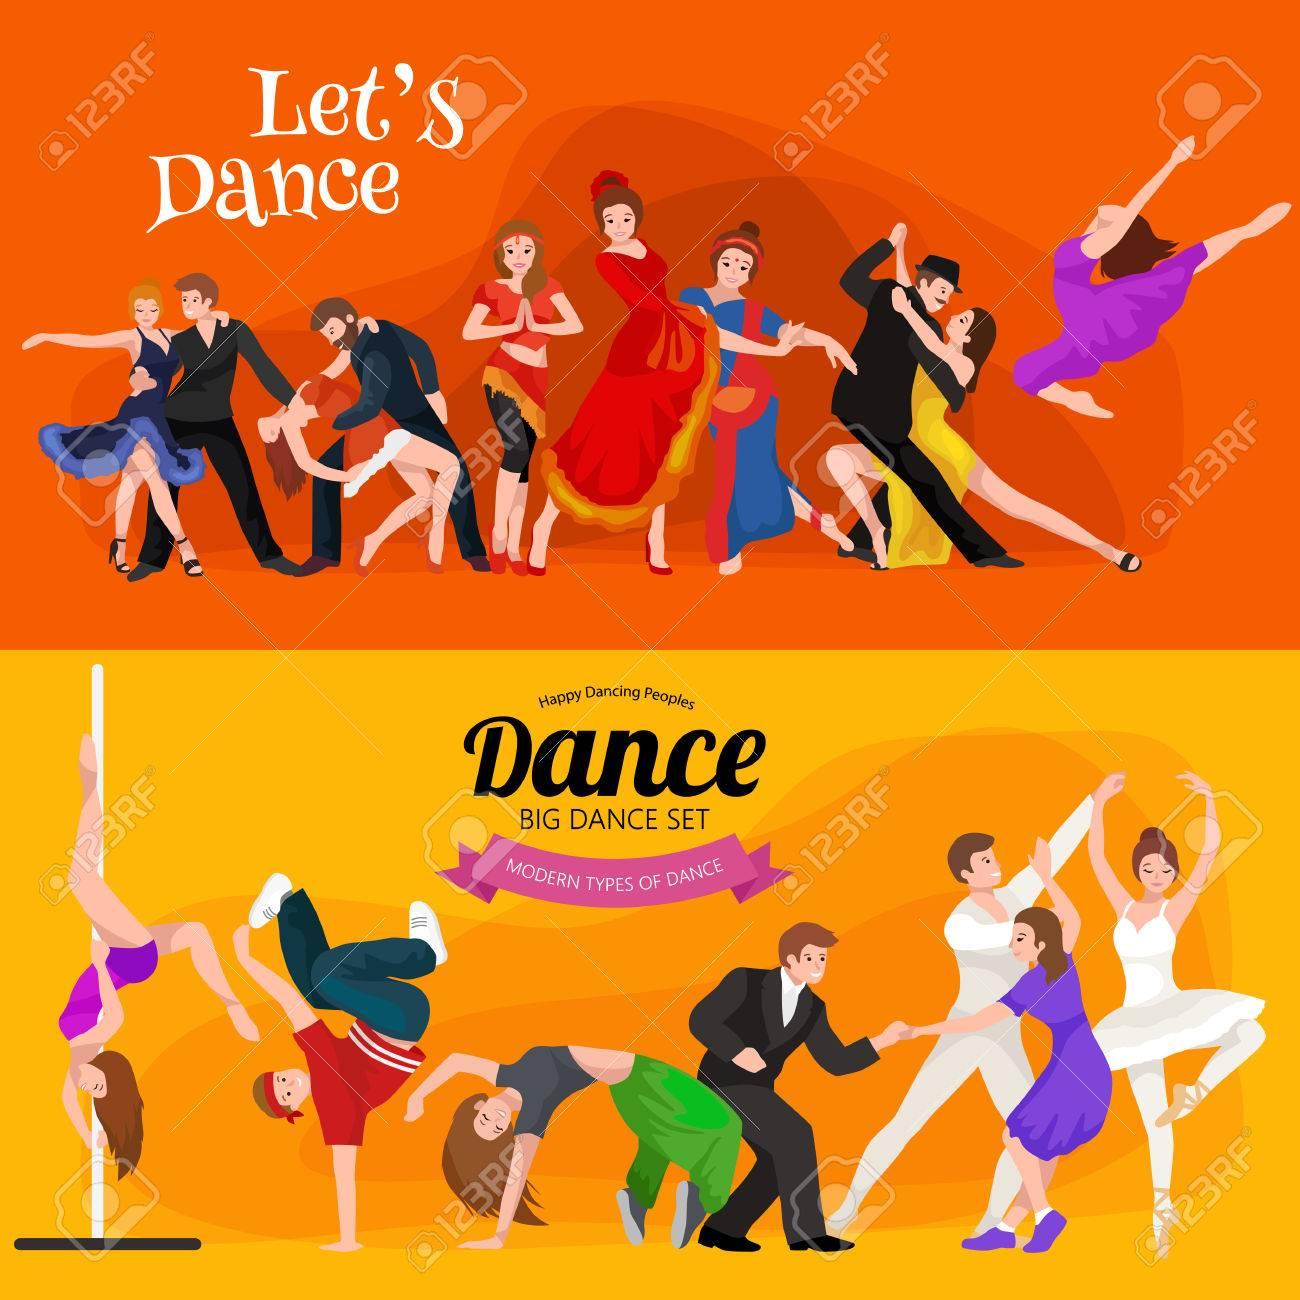 Vector illustration of couple dancing modern dance, Partners